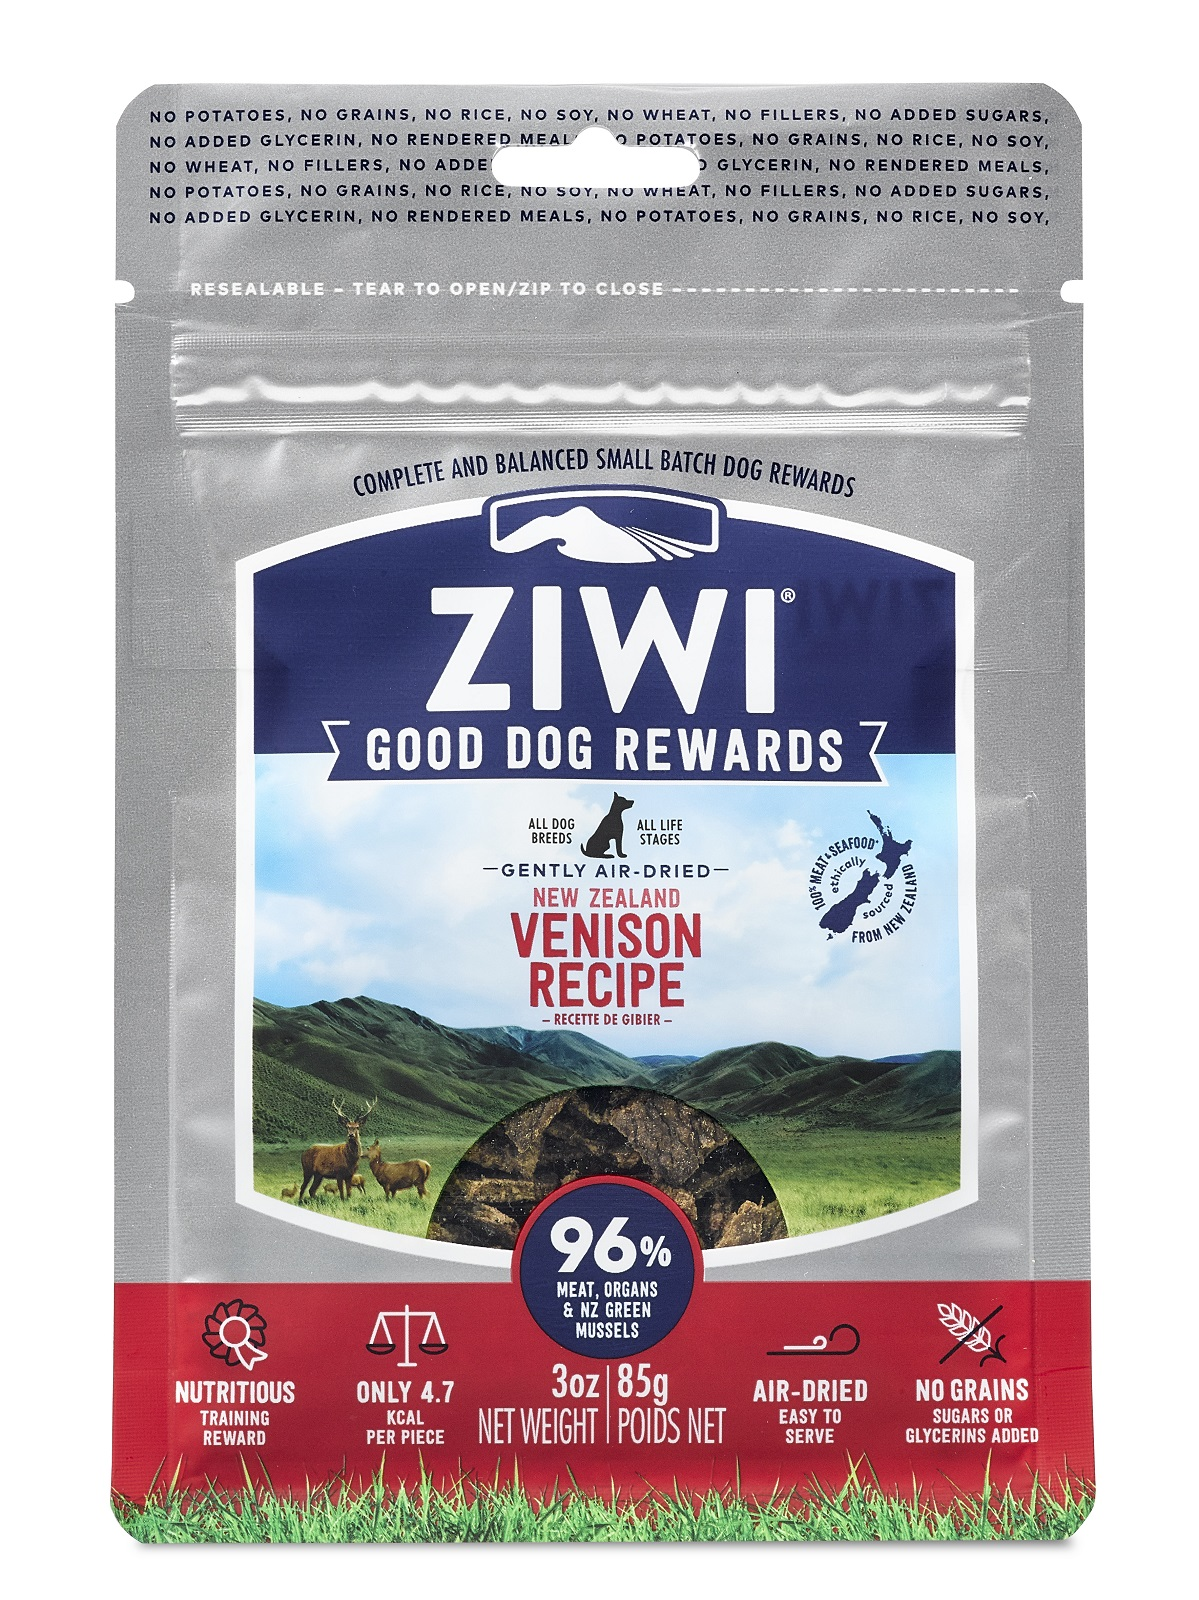 ZIWI Good Dog Rewards Venison Recipe Air-Dried Dog Treats, 3-oz